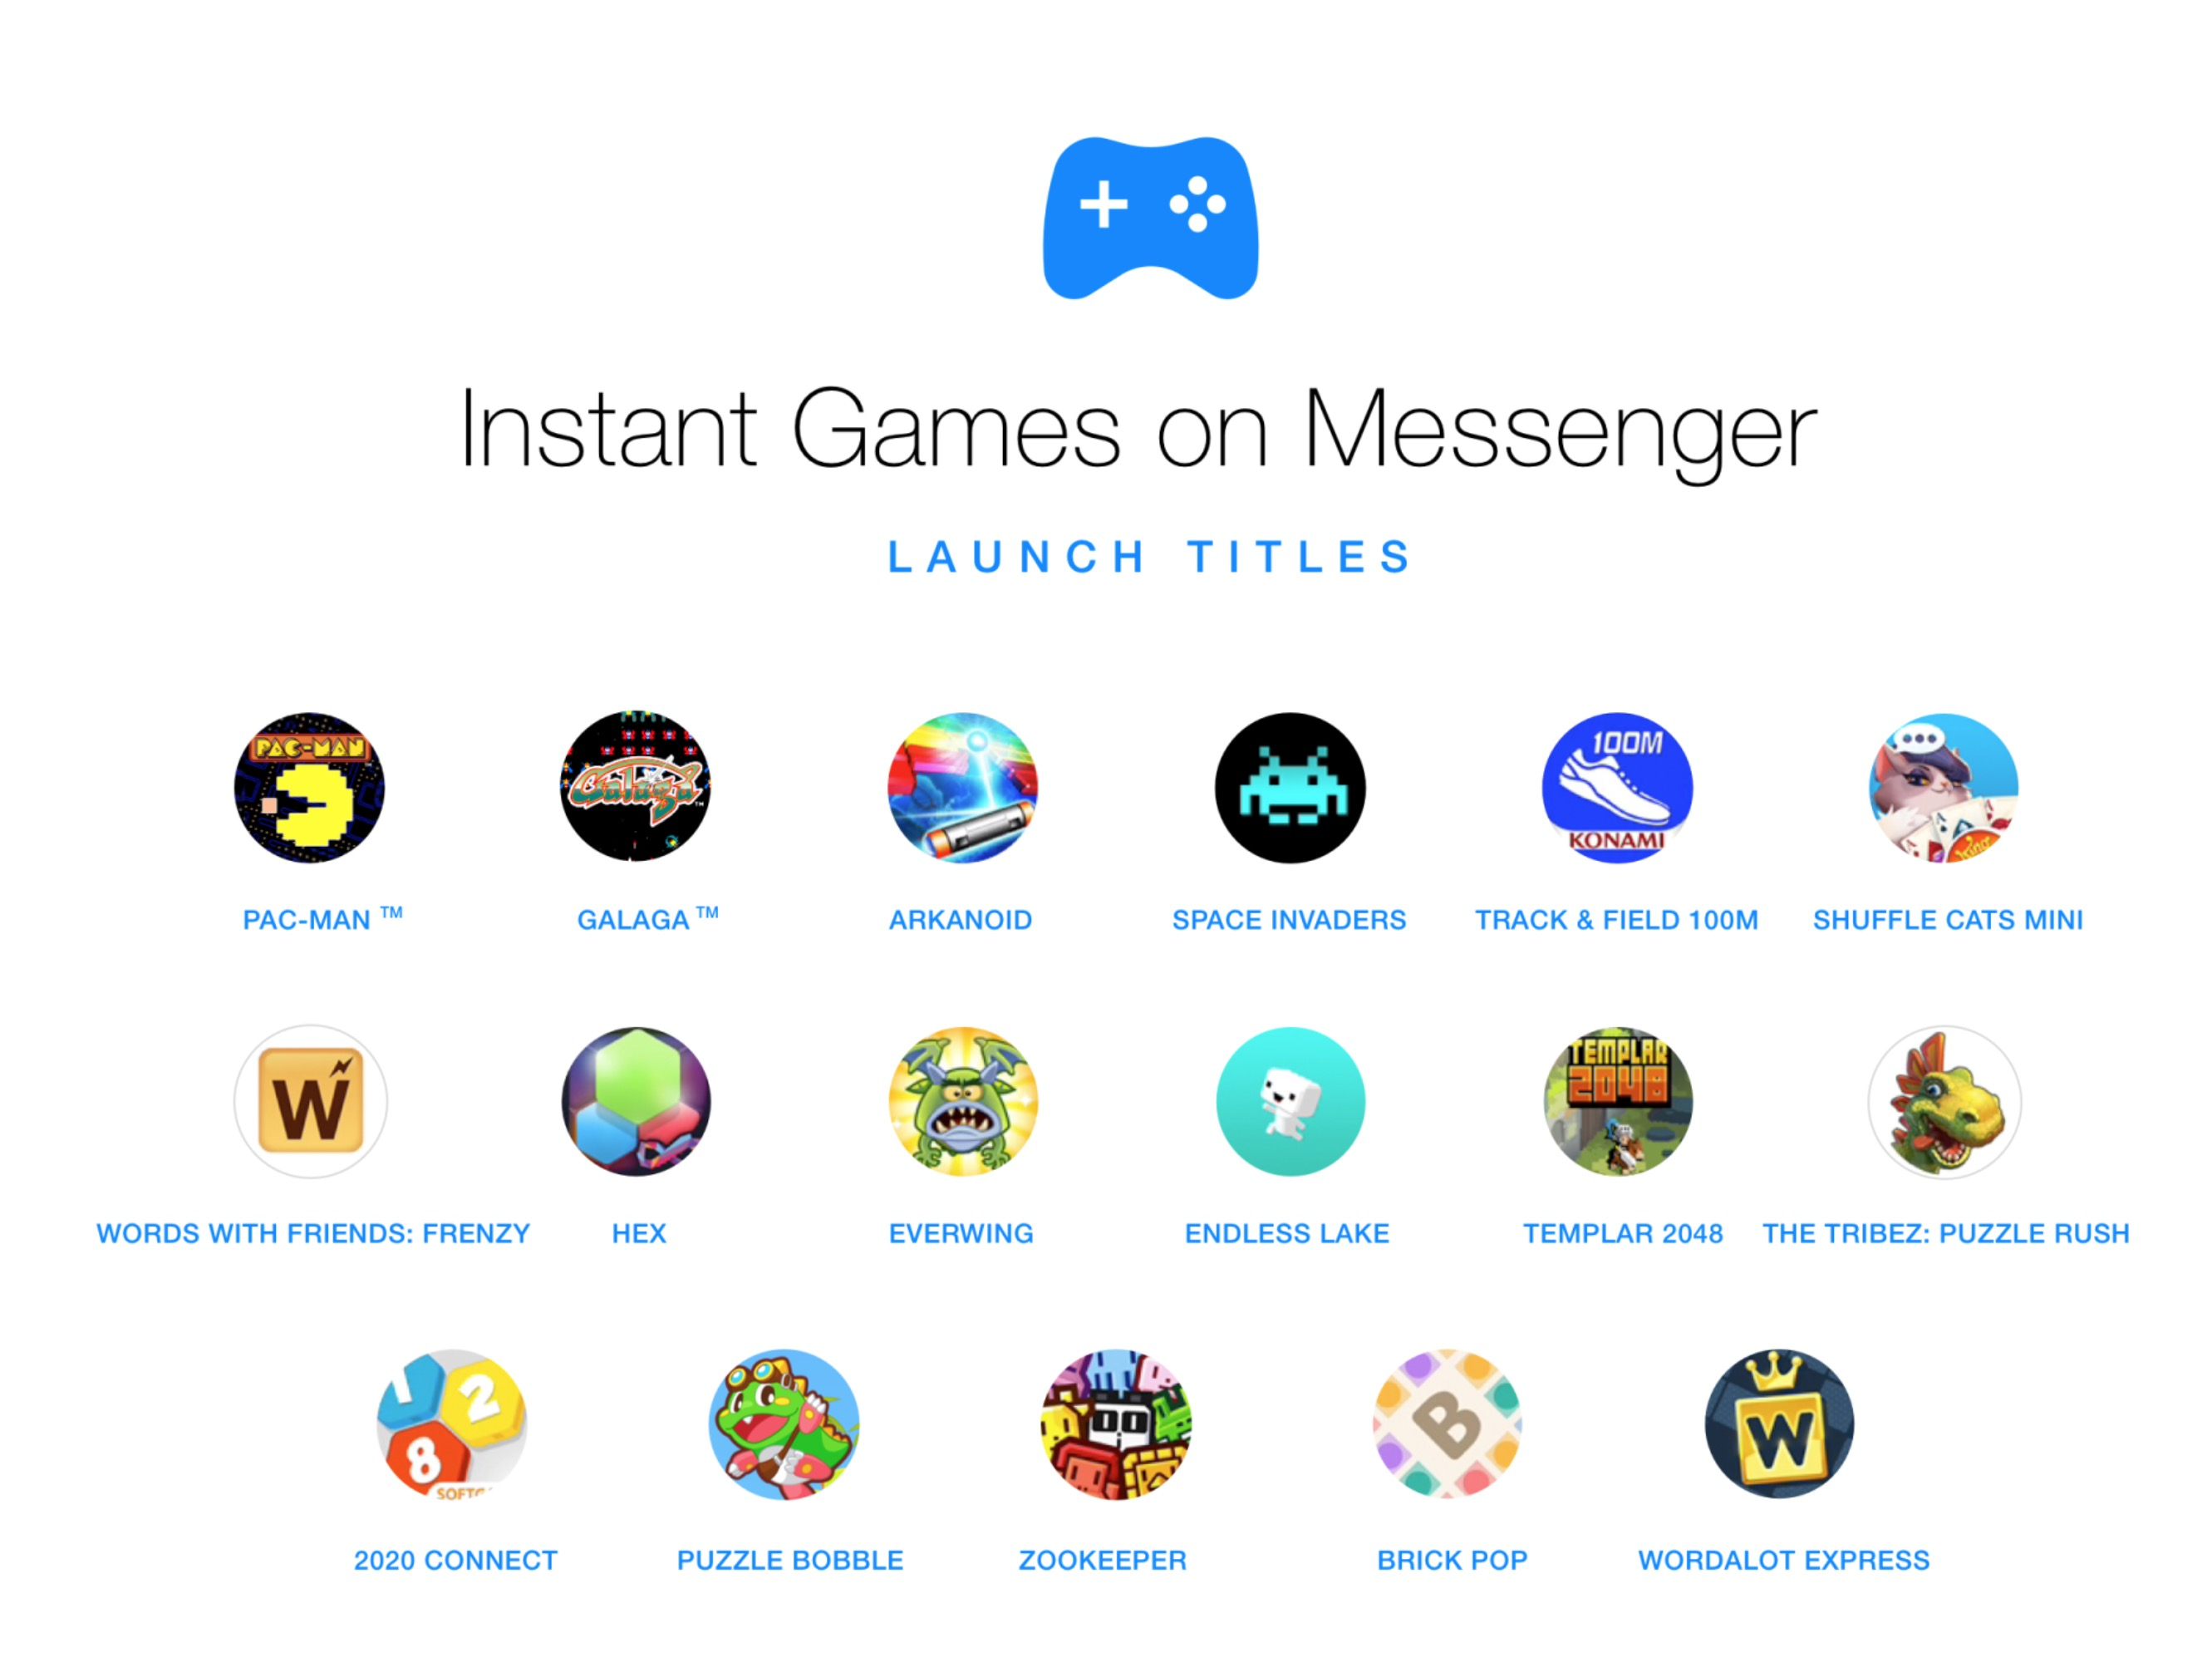 Giochi Instant Games Messenger